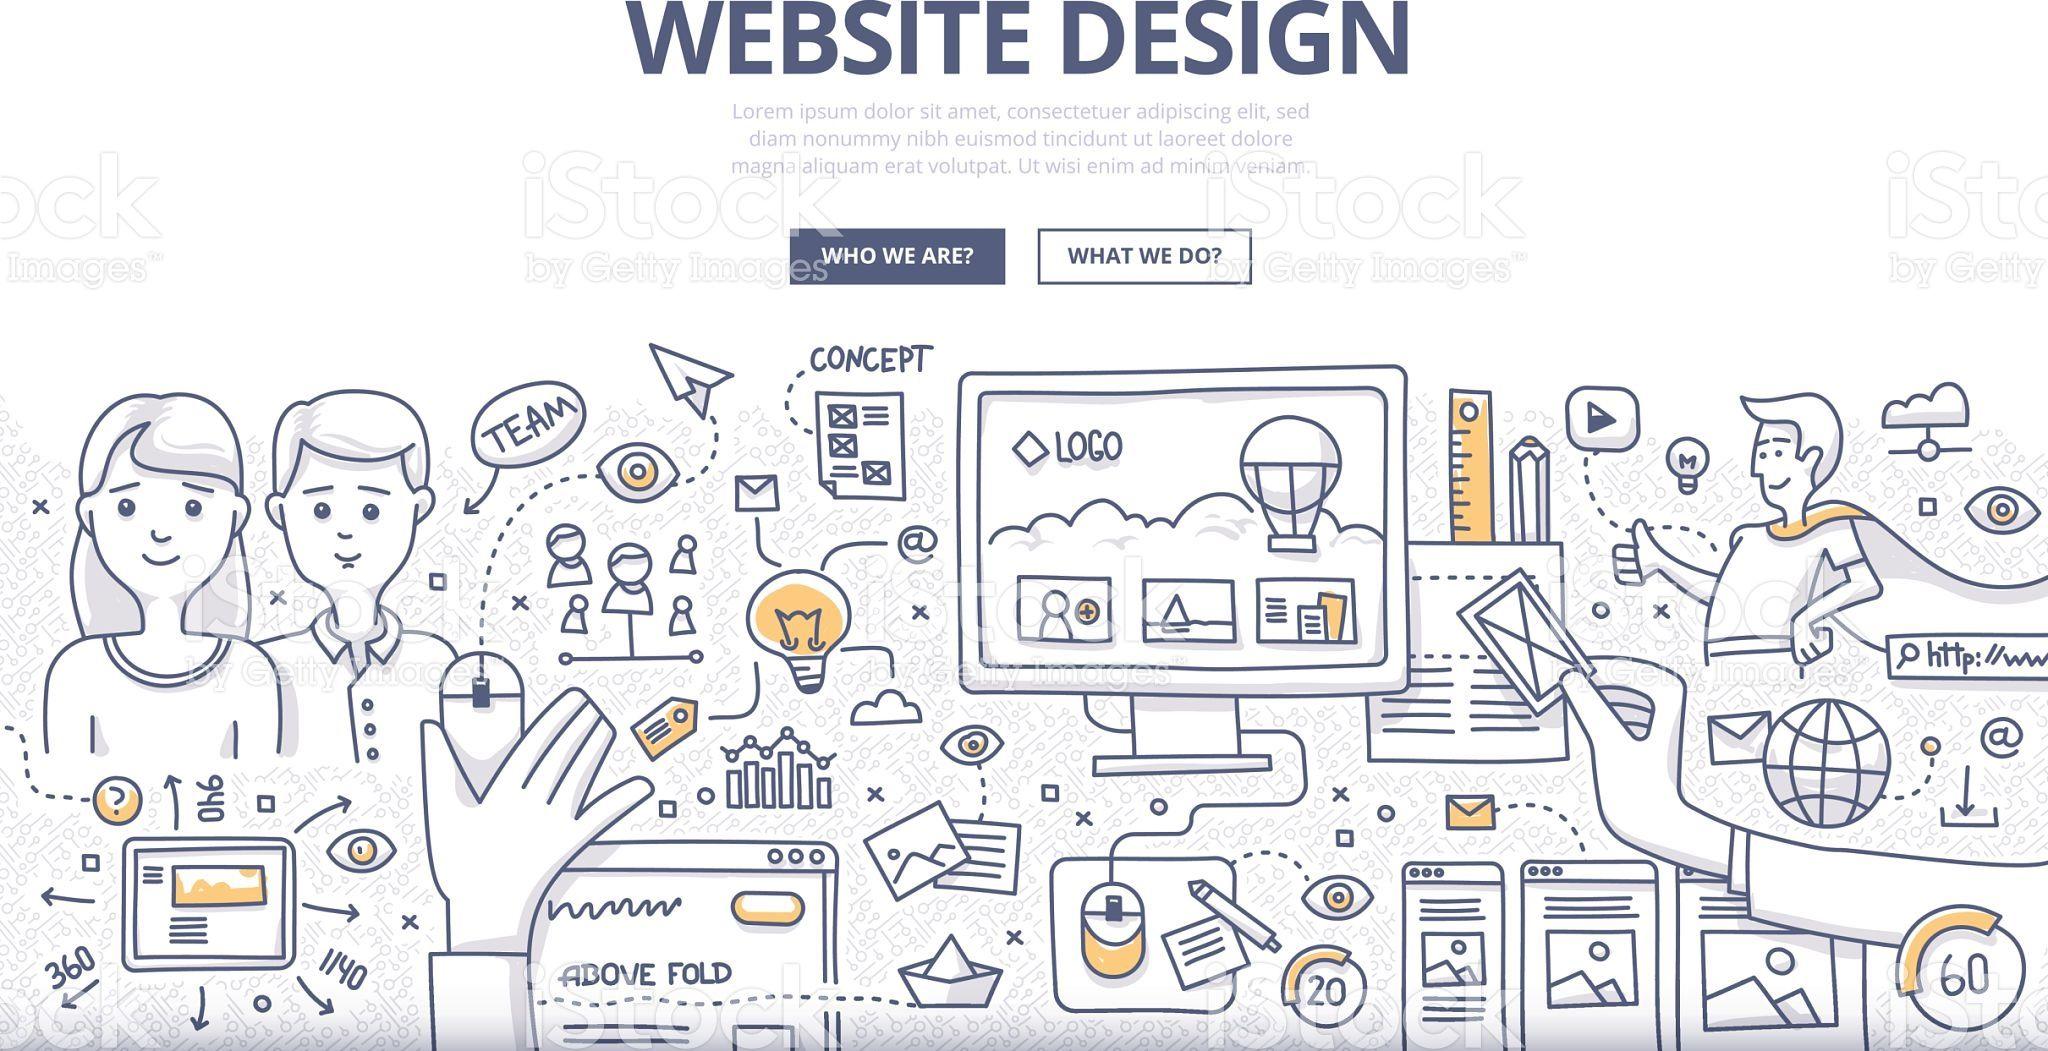 Design 3 Web Design Doodle Designs Doodle Art Designs